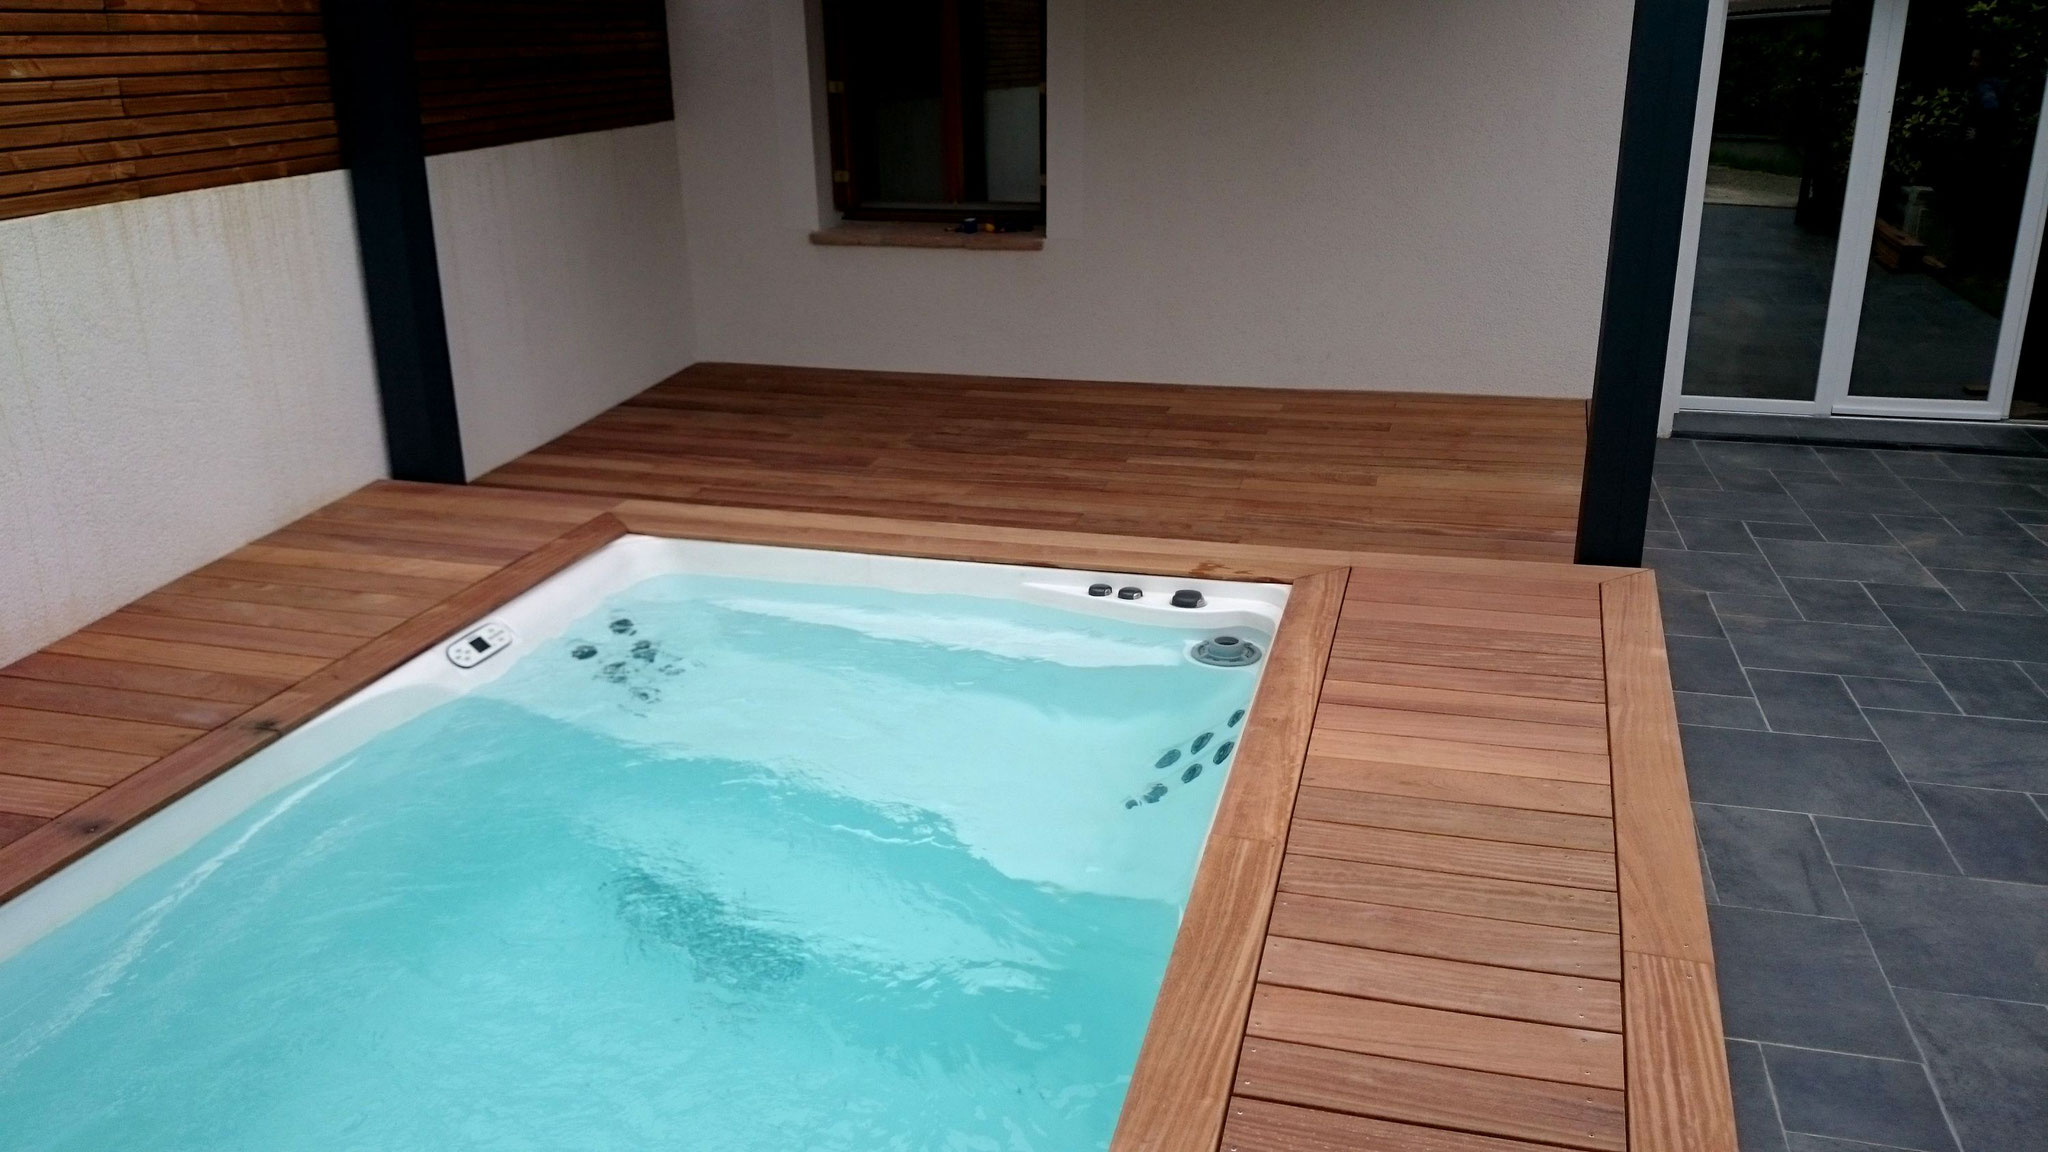 PRETTY POOL Mini piscine    4,25 m x 2,15 m x 1,30 m   ( -10 m2:  aucune démarche administrative)